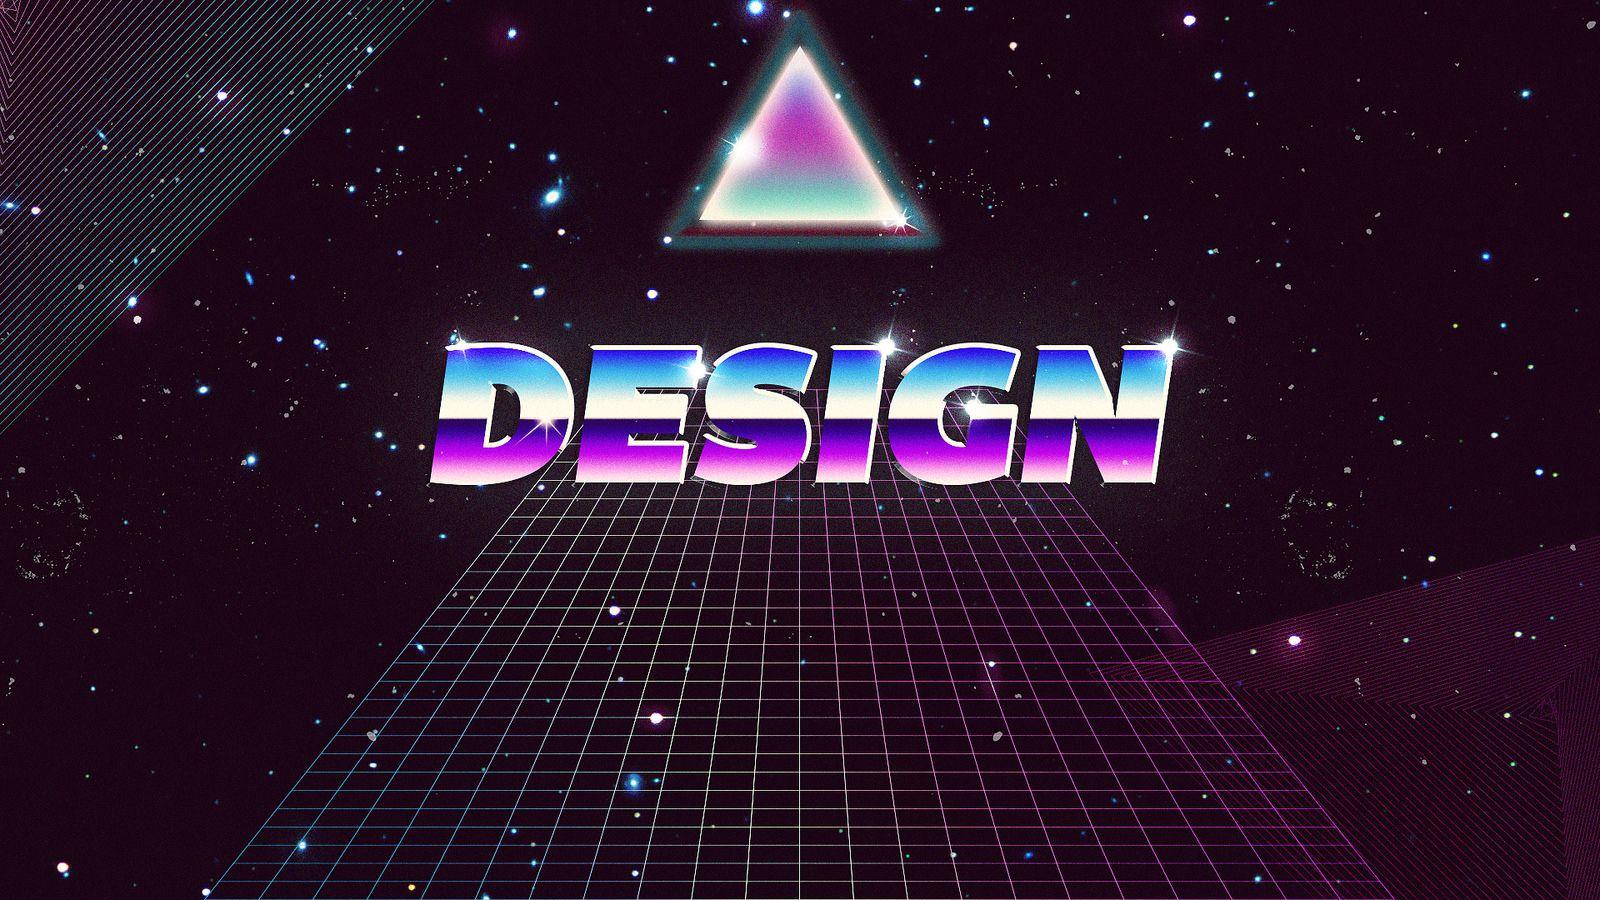 Eternity by Graphixo, Edson Sampaio, Goiânia, Brazil on Flickr | Design | Typography | Tipografia | Retro | Graphic Design | Squares | Triangle | Quadrado | Triângulo | Square | Space | Universe | Galaxy | Stars | Estrelas |